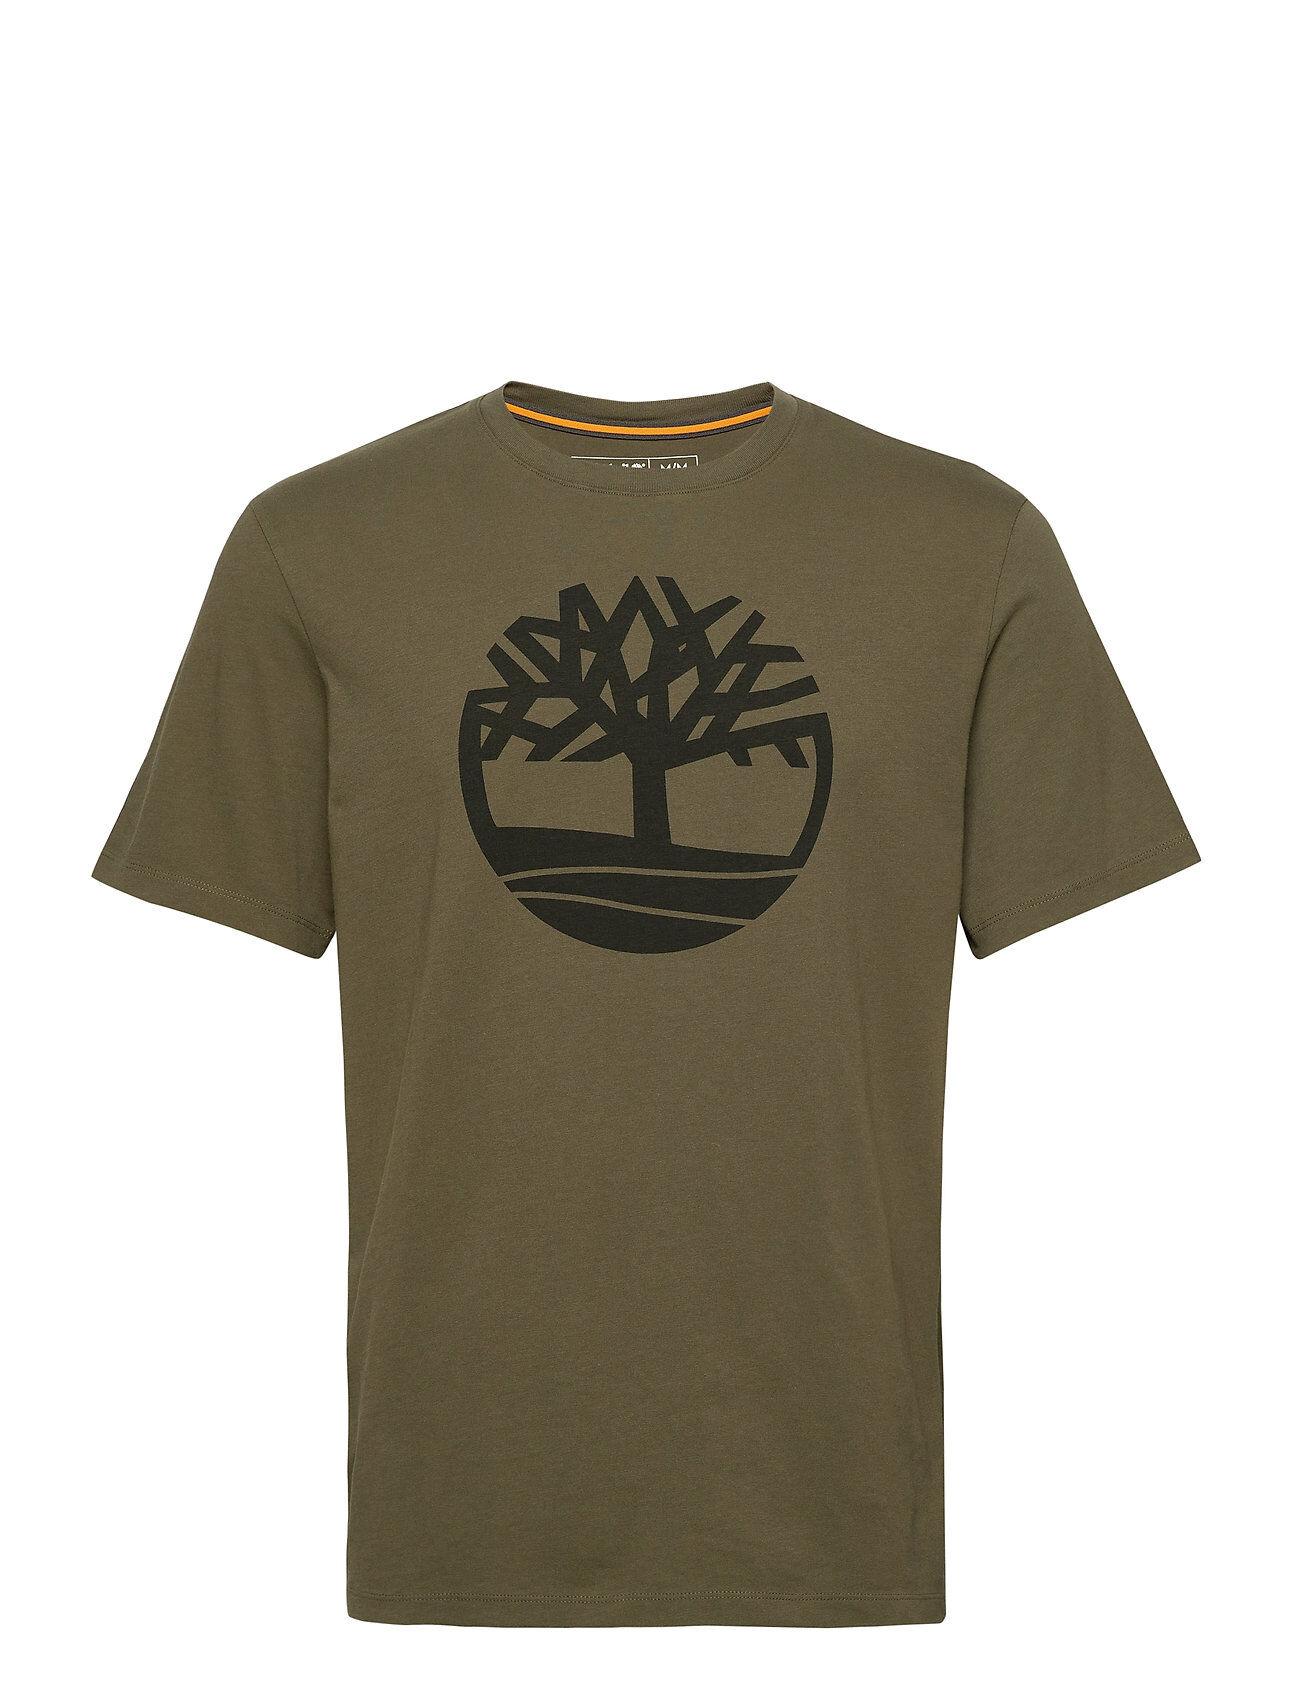 Timberland Ss K-R Brand Tree T T-shirts Short-sleeved Vihreä Timberland